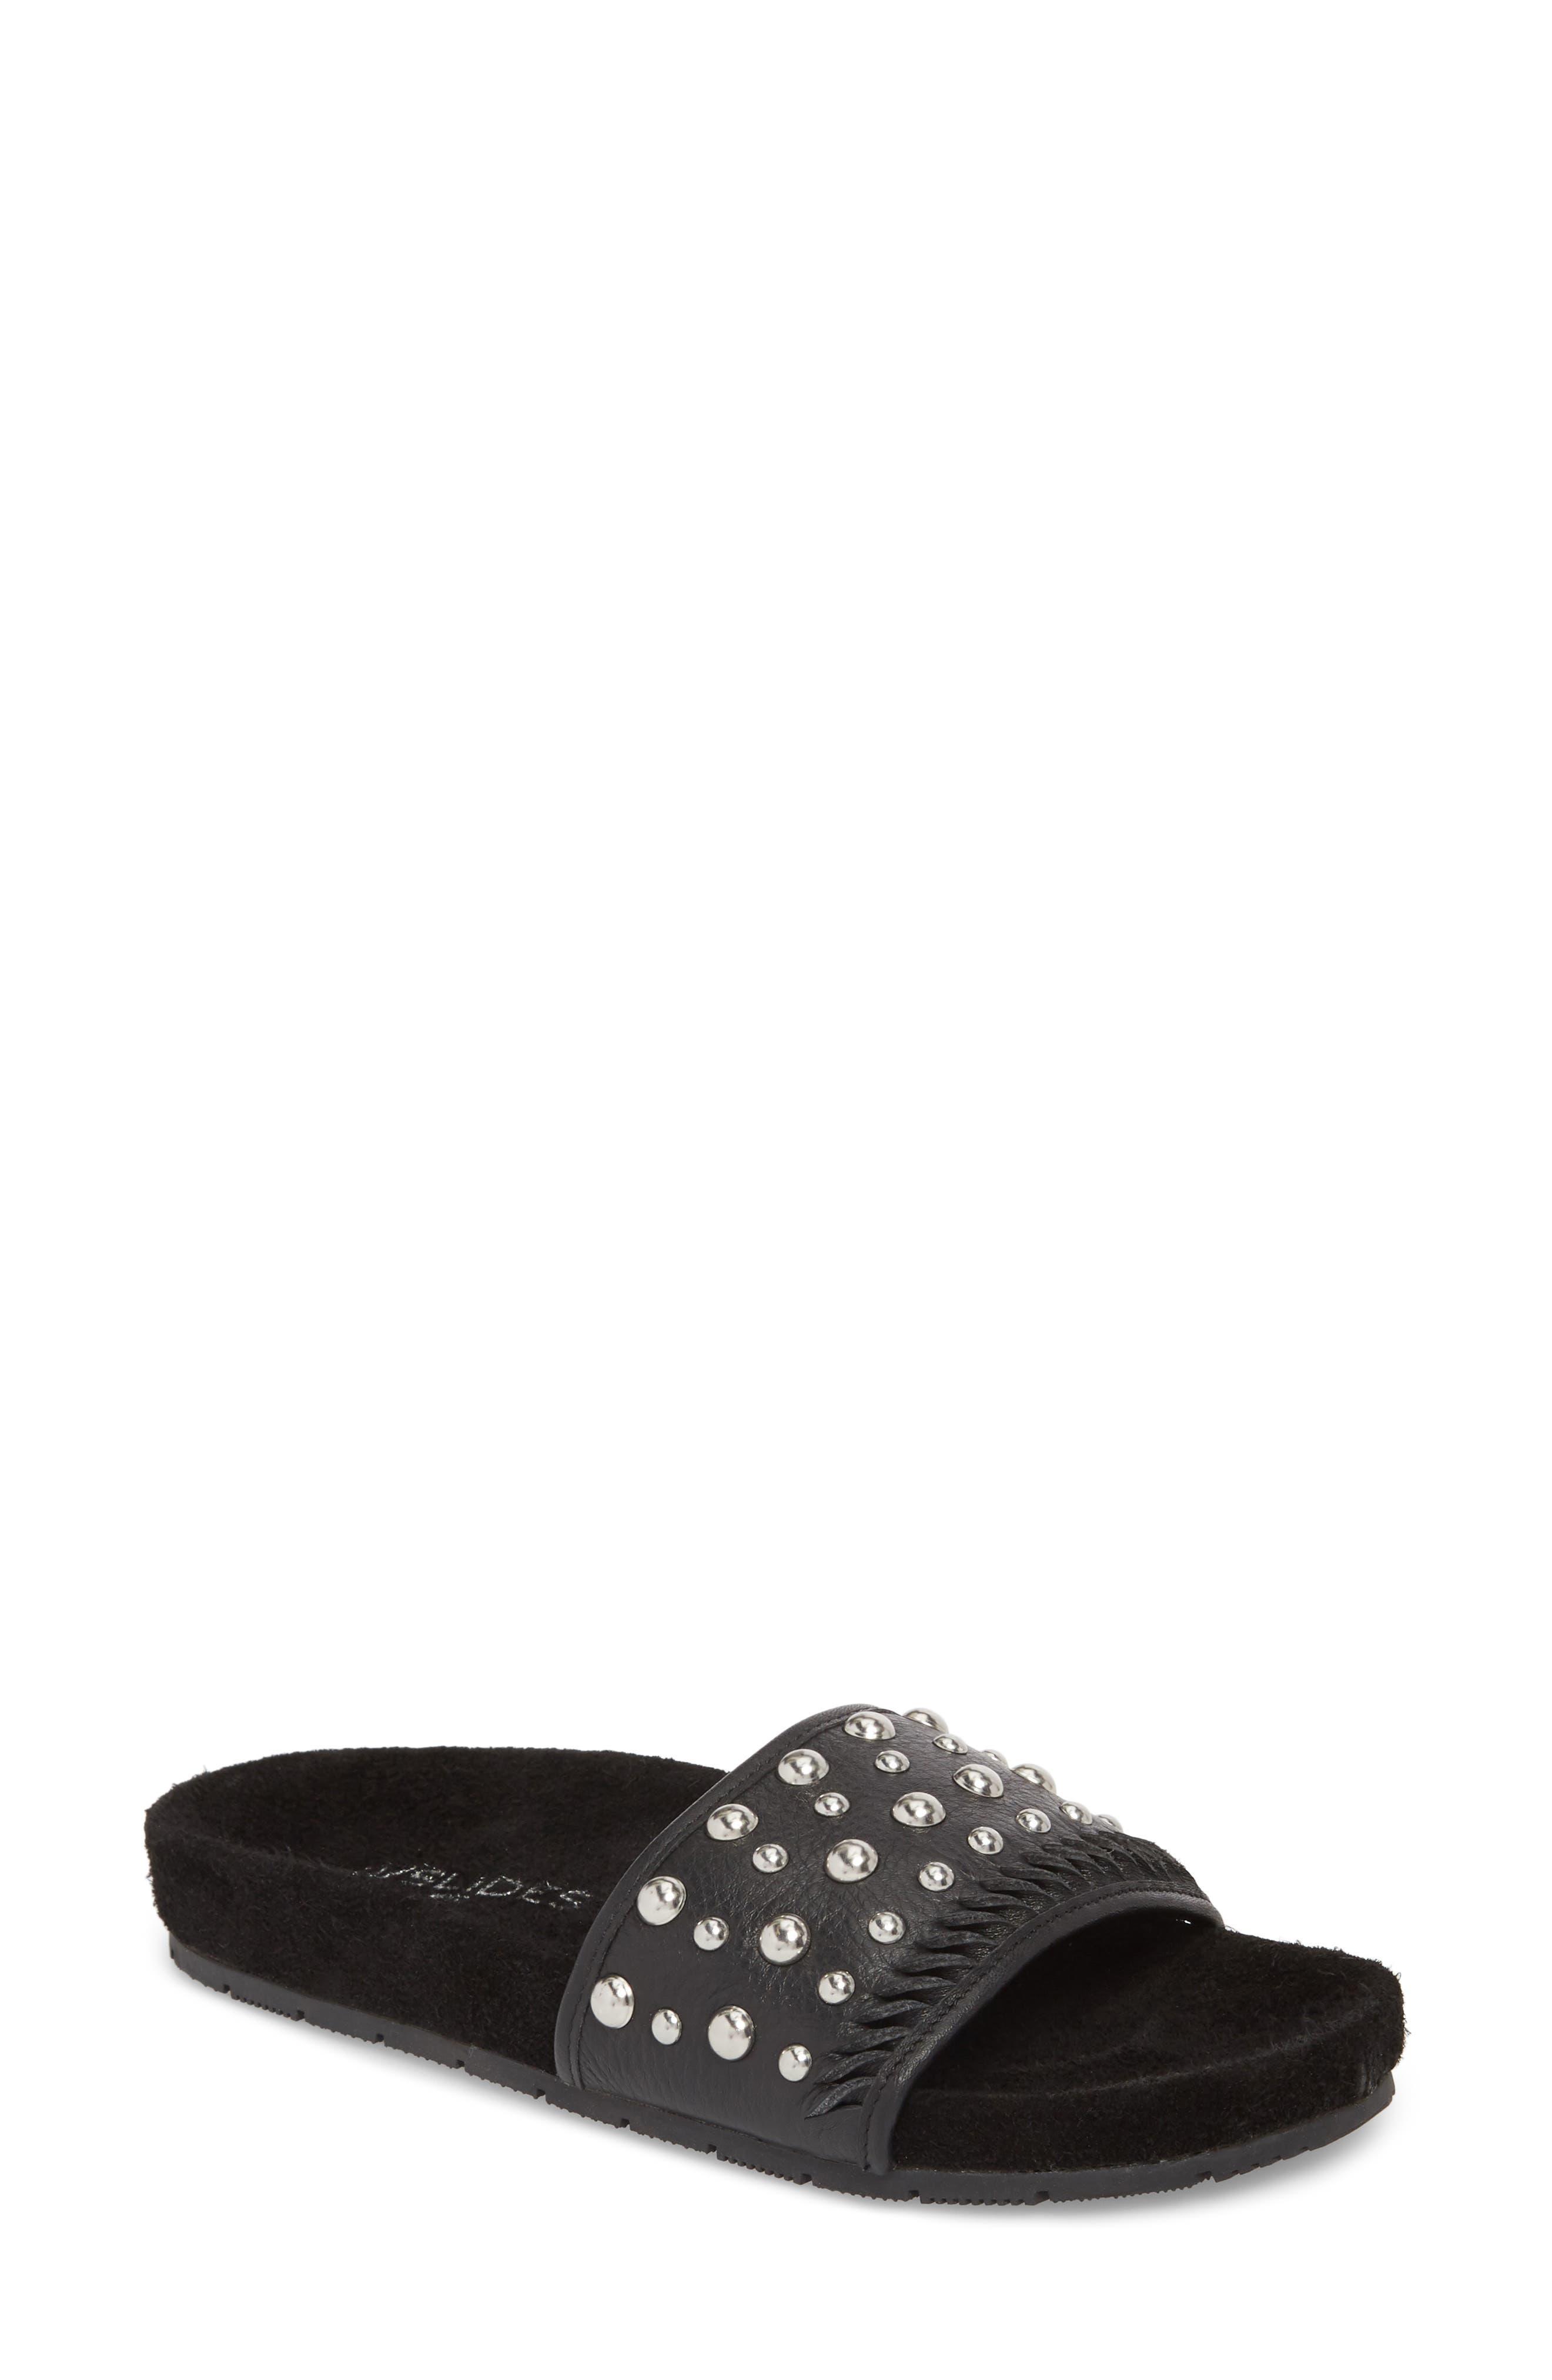 Nora Studded Slide Sandal,                             Main thumbnail 1, color,                             BLACK SUEDE